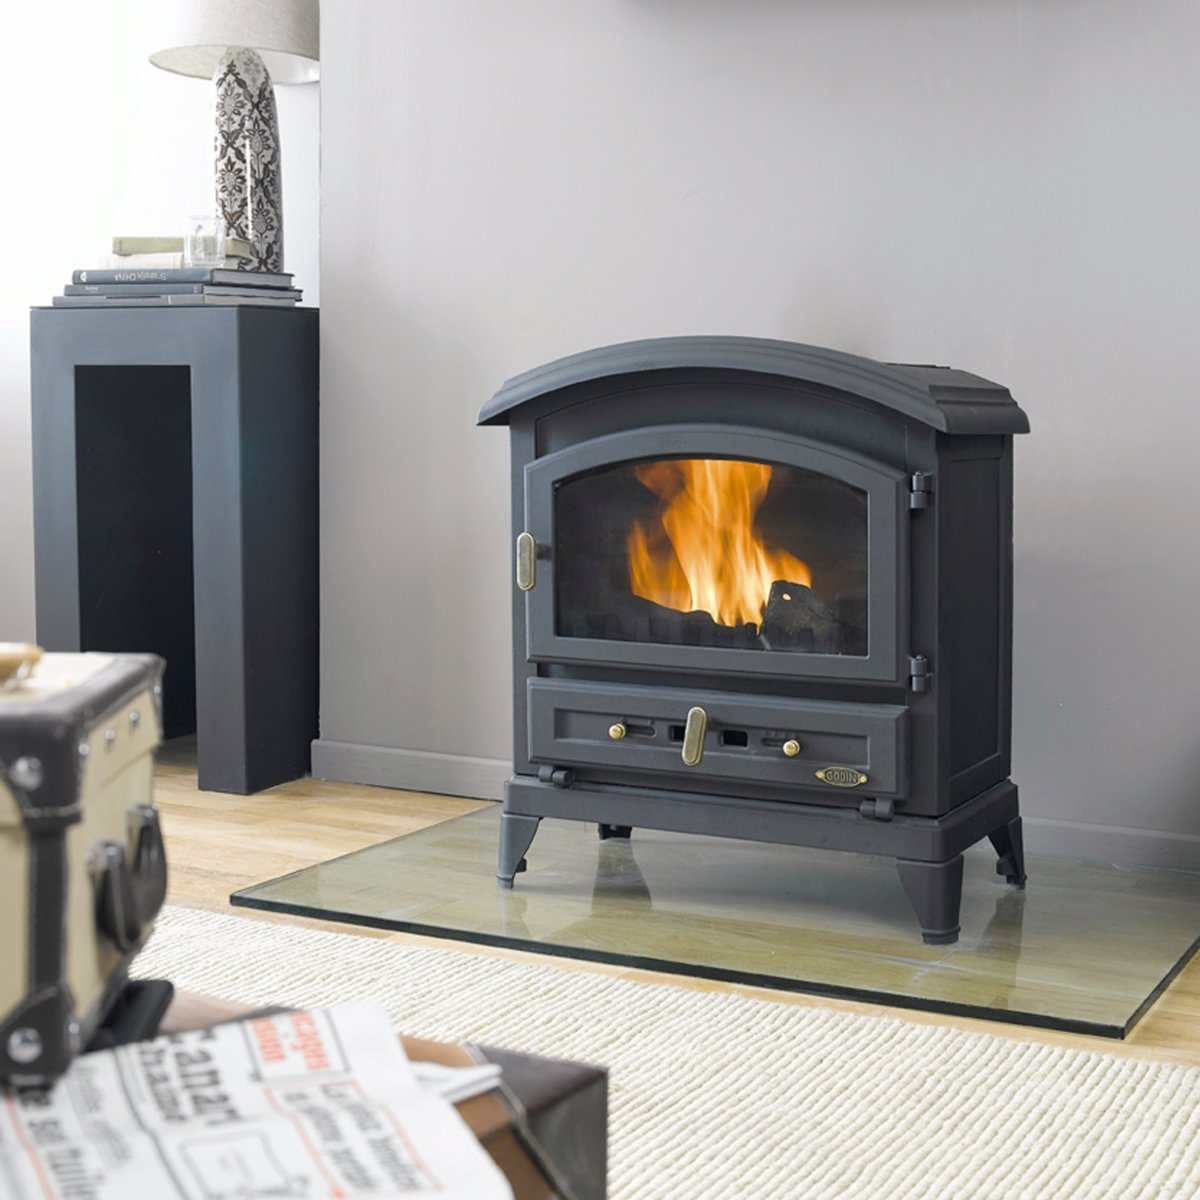 design petit poel a bois cuisine design et d coration. Black Bedroom Furniture Sets. Home Design Ideas